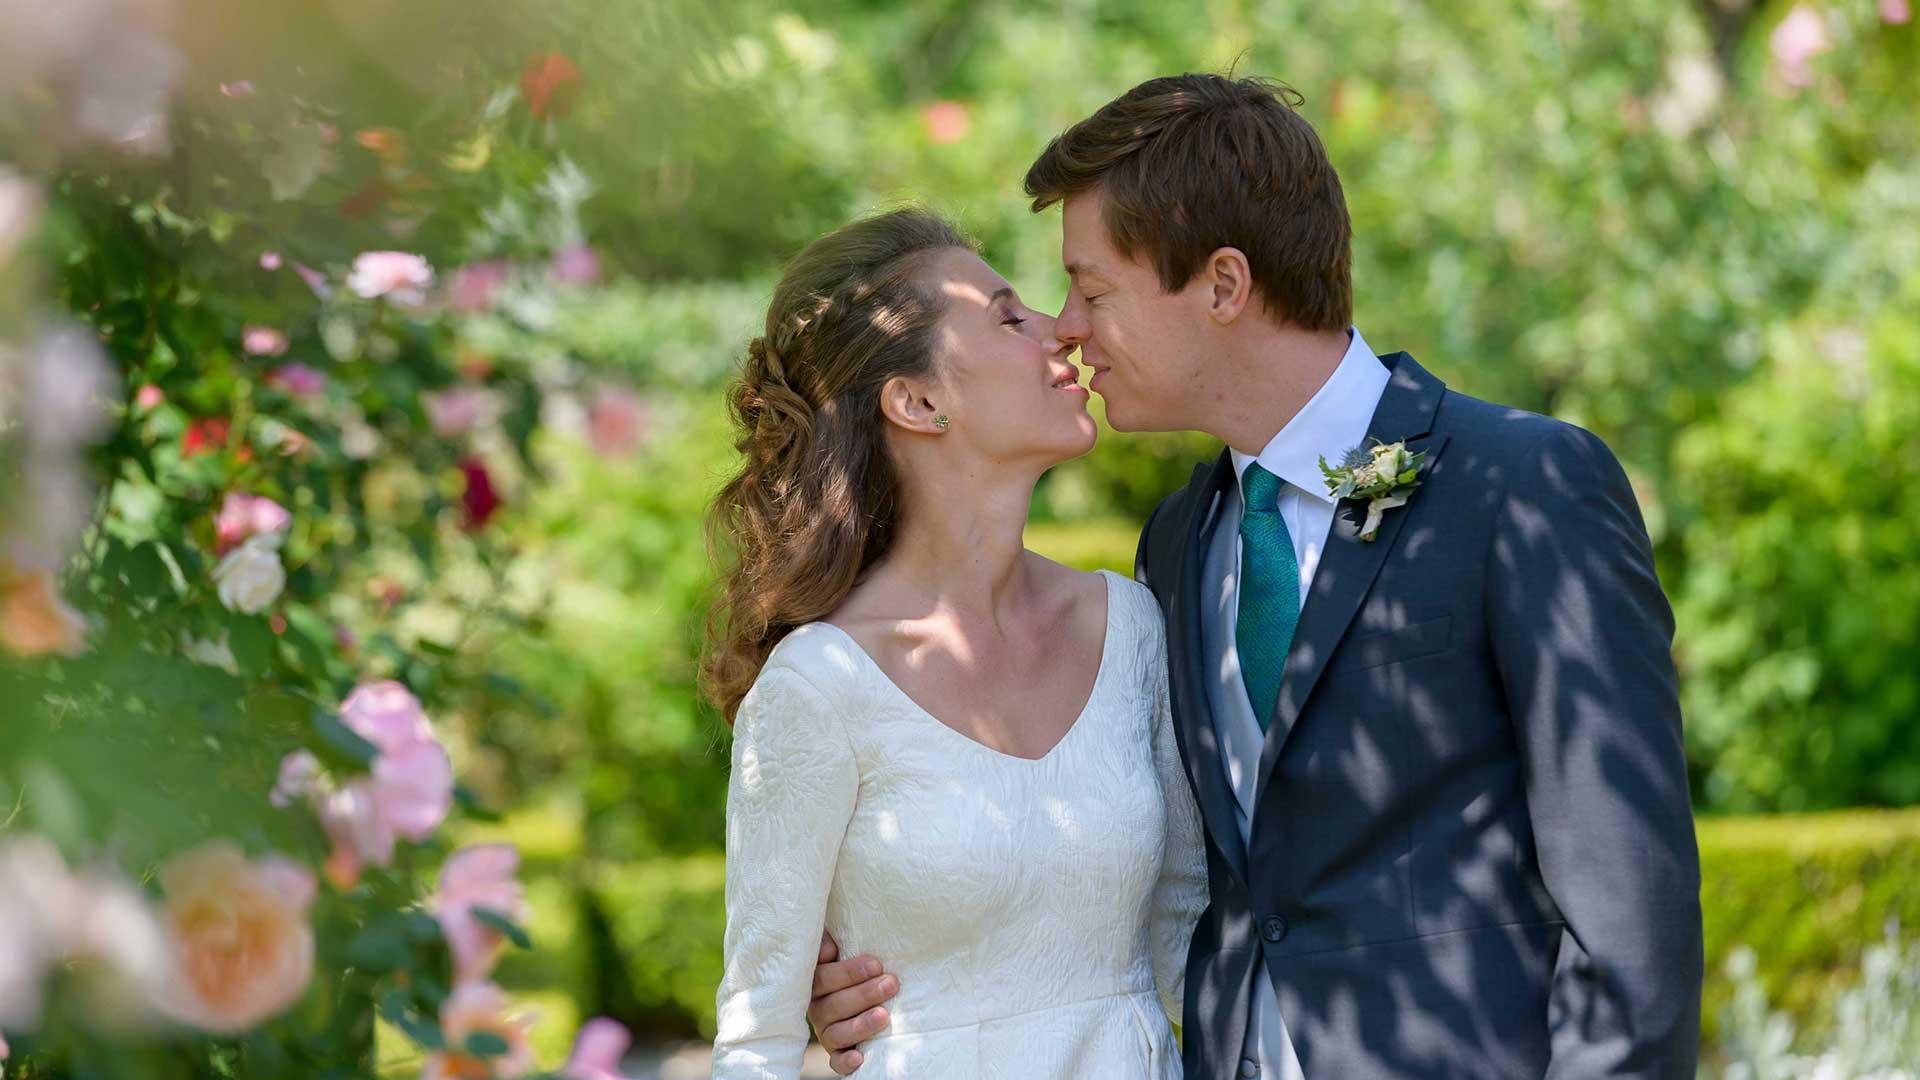 photographe-mariage-ile-de-france-10